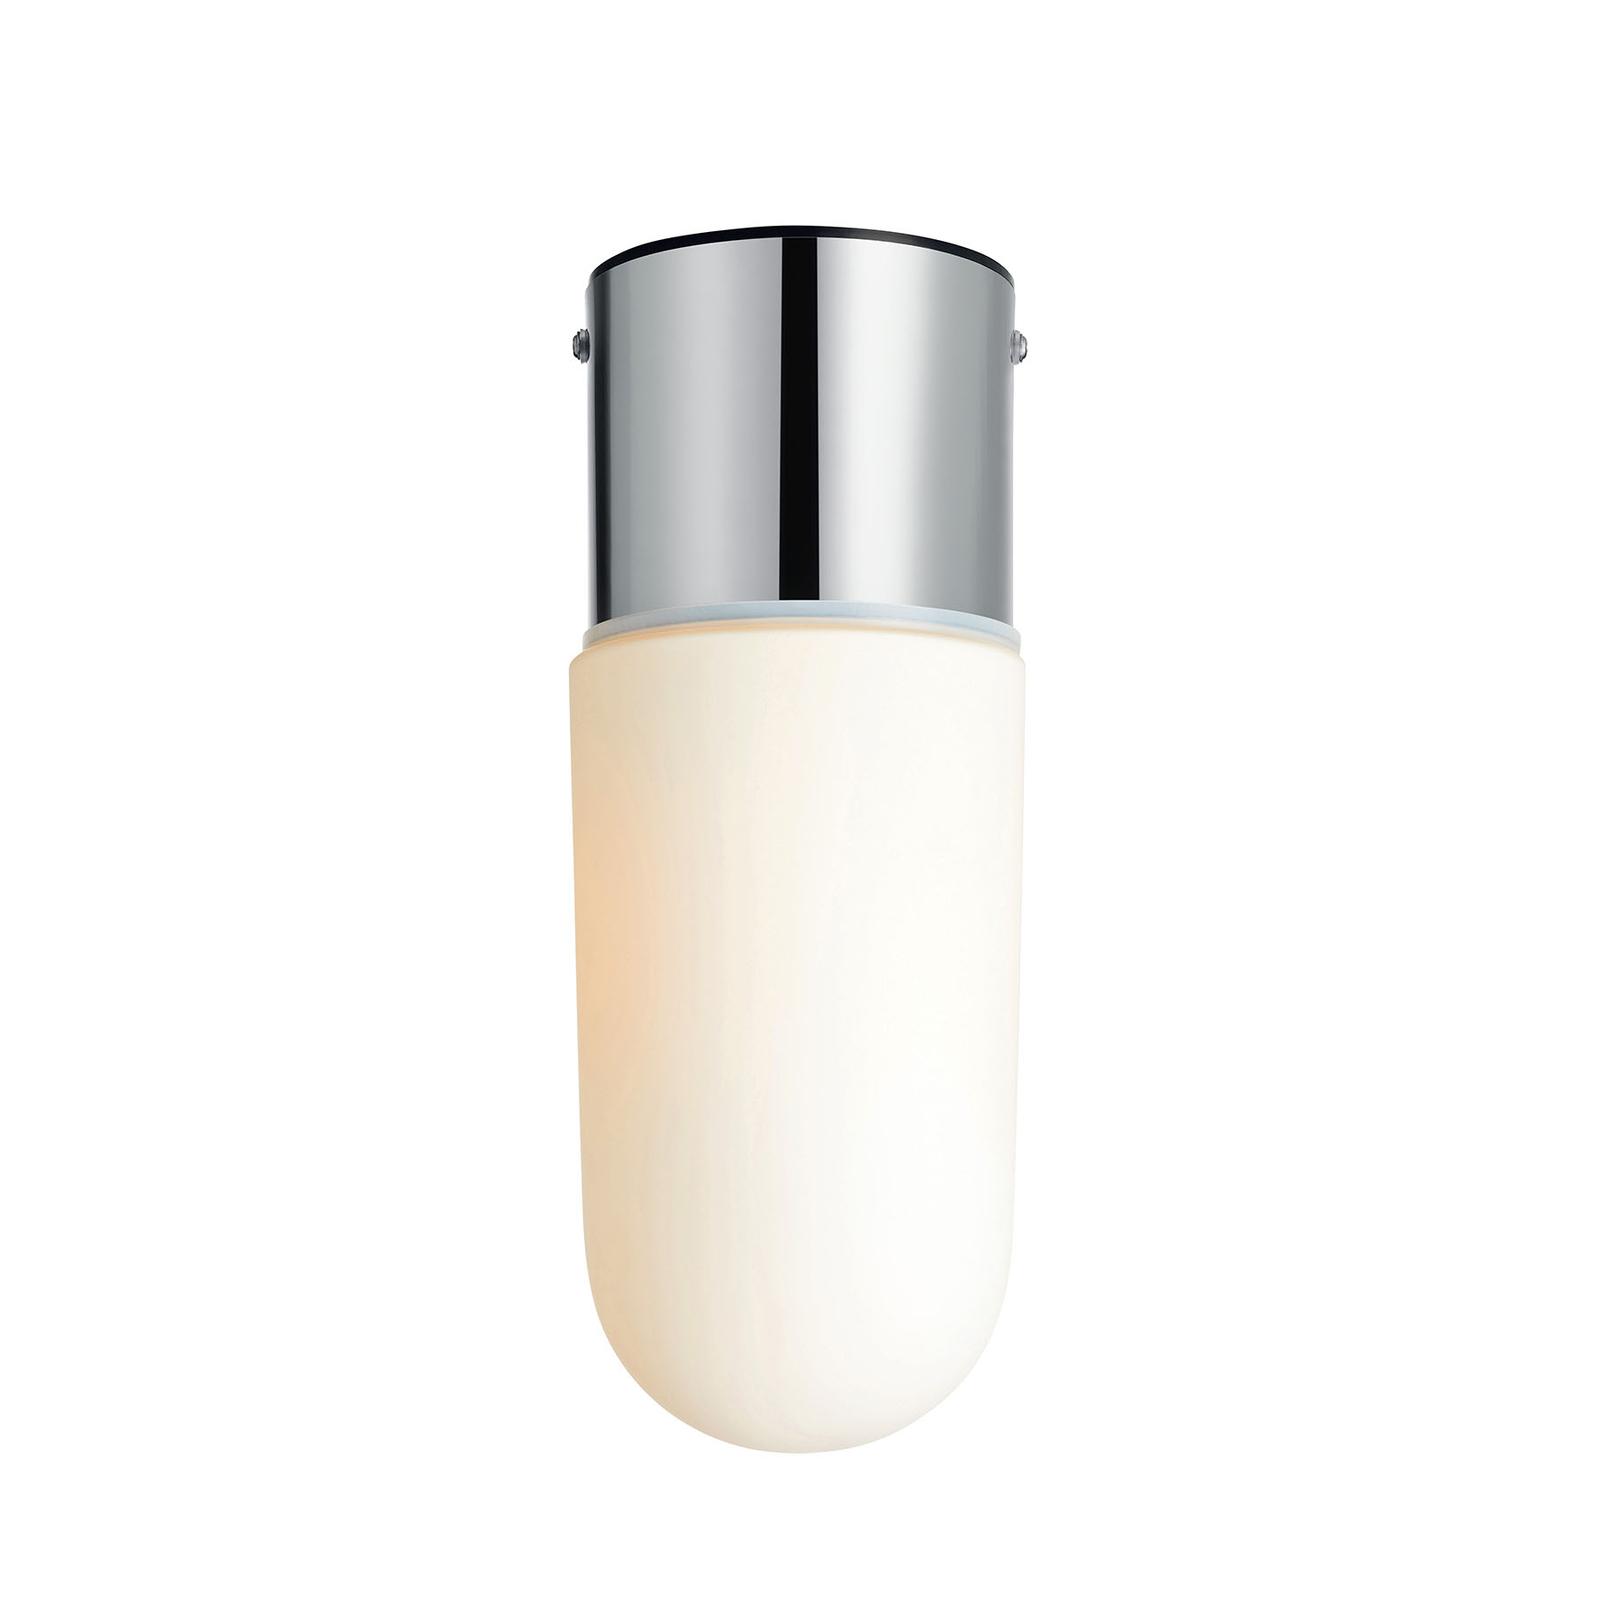 Plafondlamp Zen, matglas, chroom